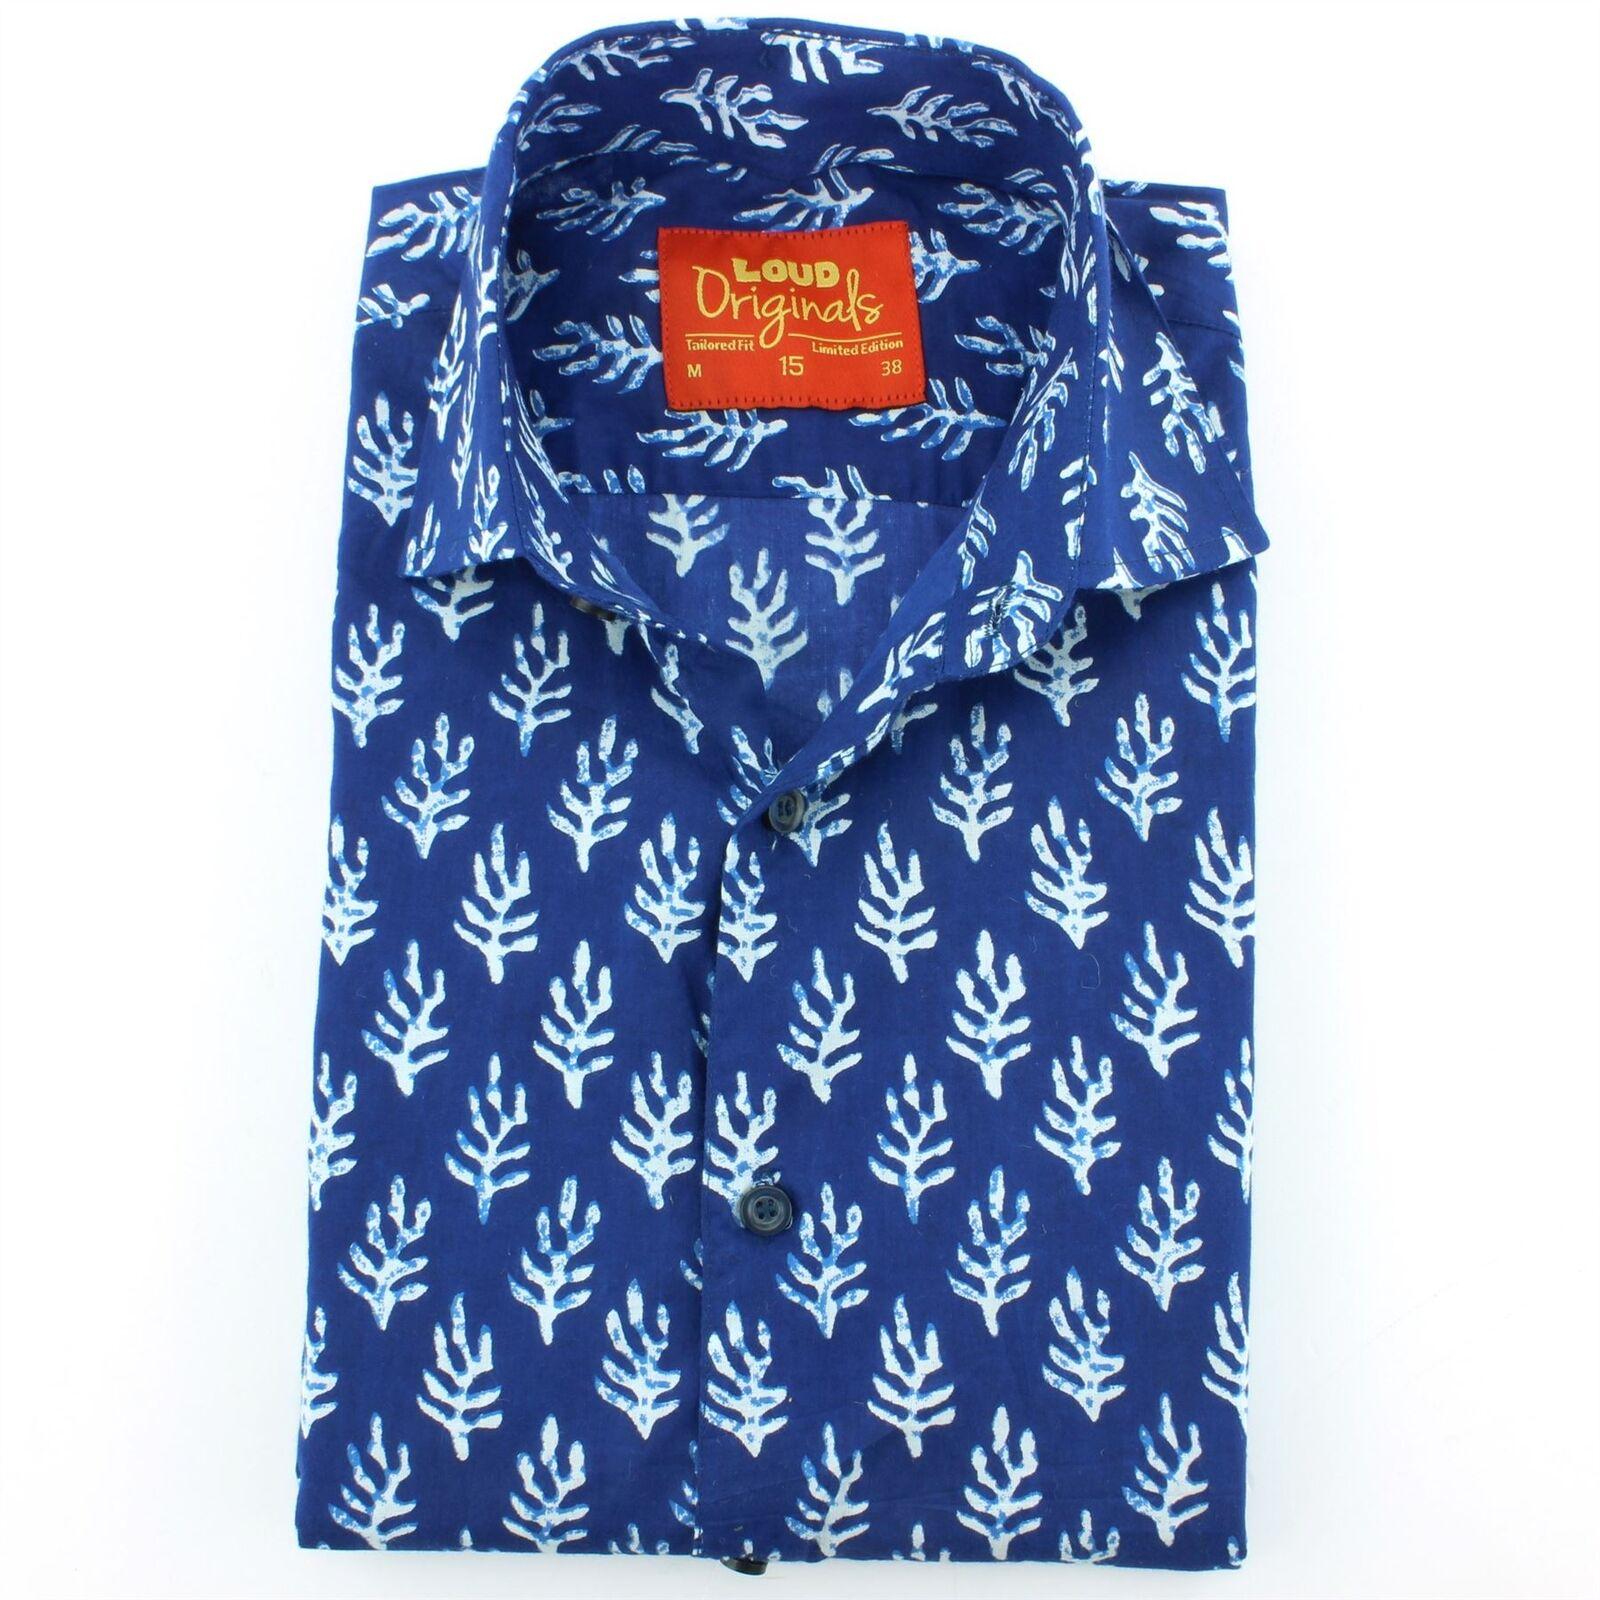 Mens Shirt Shirt Shirt Loud Originals TAILGoldt FIT Plant Blau Retro Psychedelic Fancy  | Moderate Kosten  | Neuankömmling  | Reichhaltiges Design  a3477b